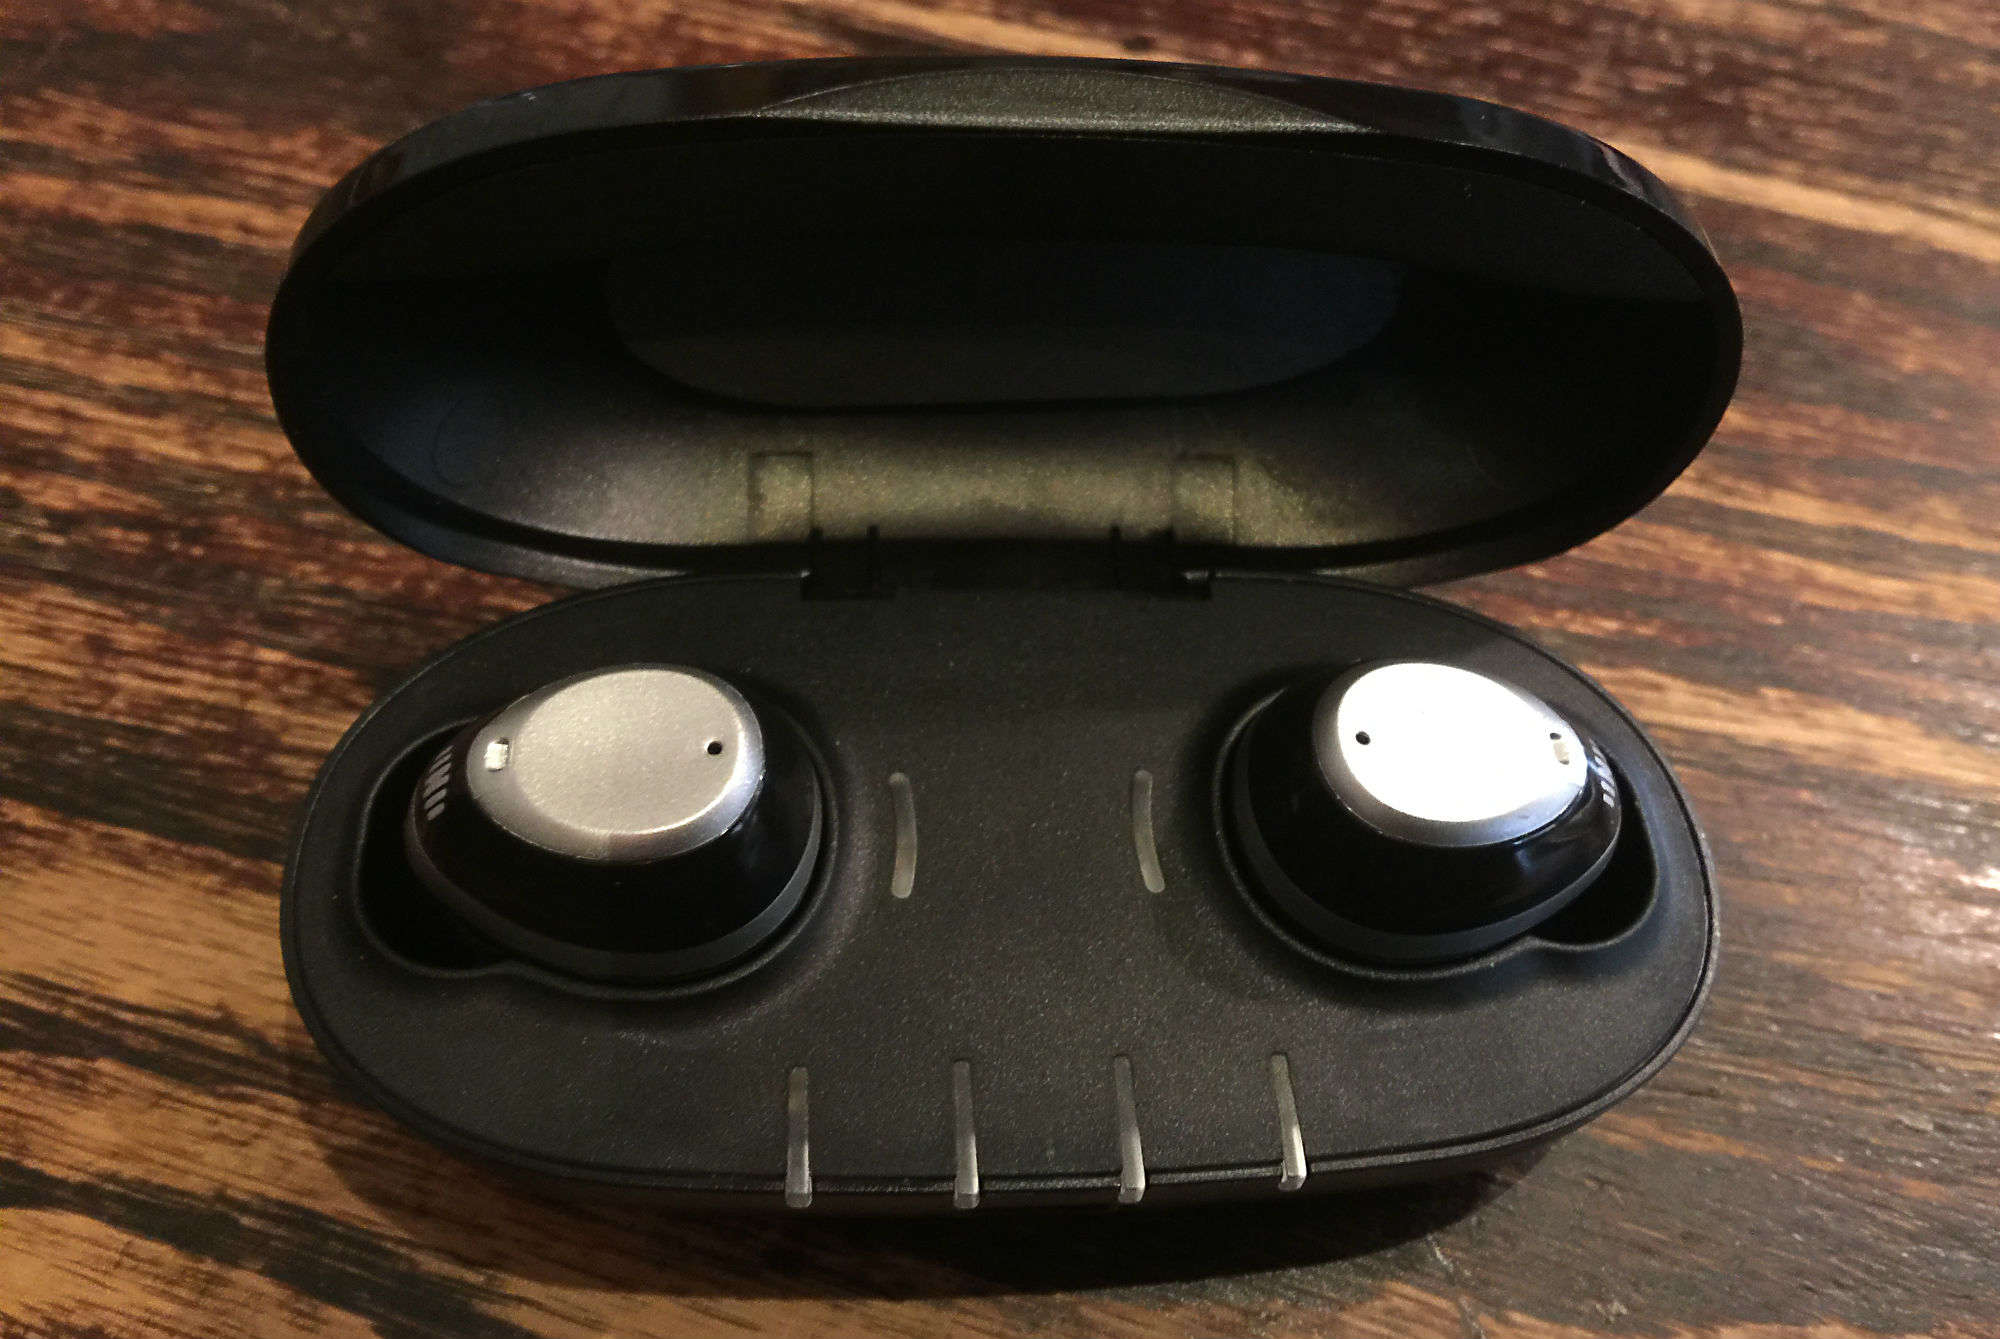 Nuheara's smart wireless IQbuds make AirPods look dumb